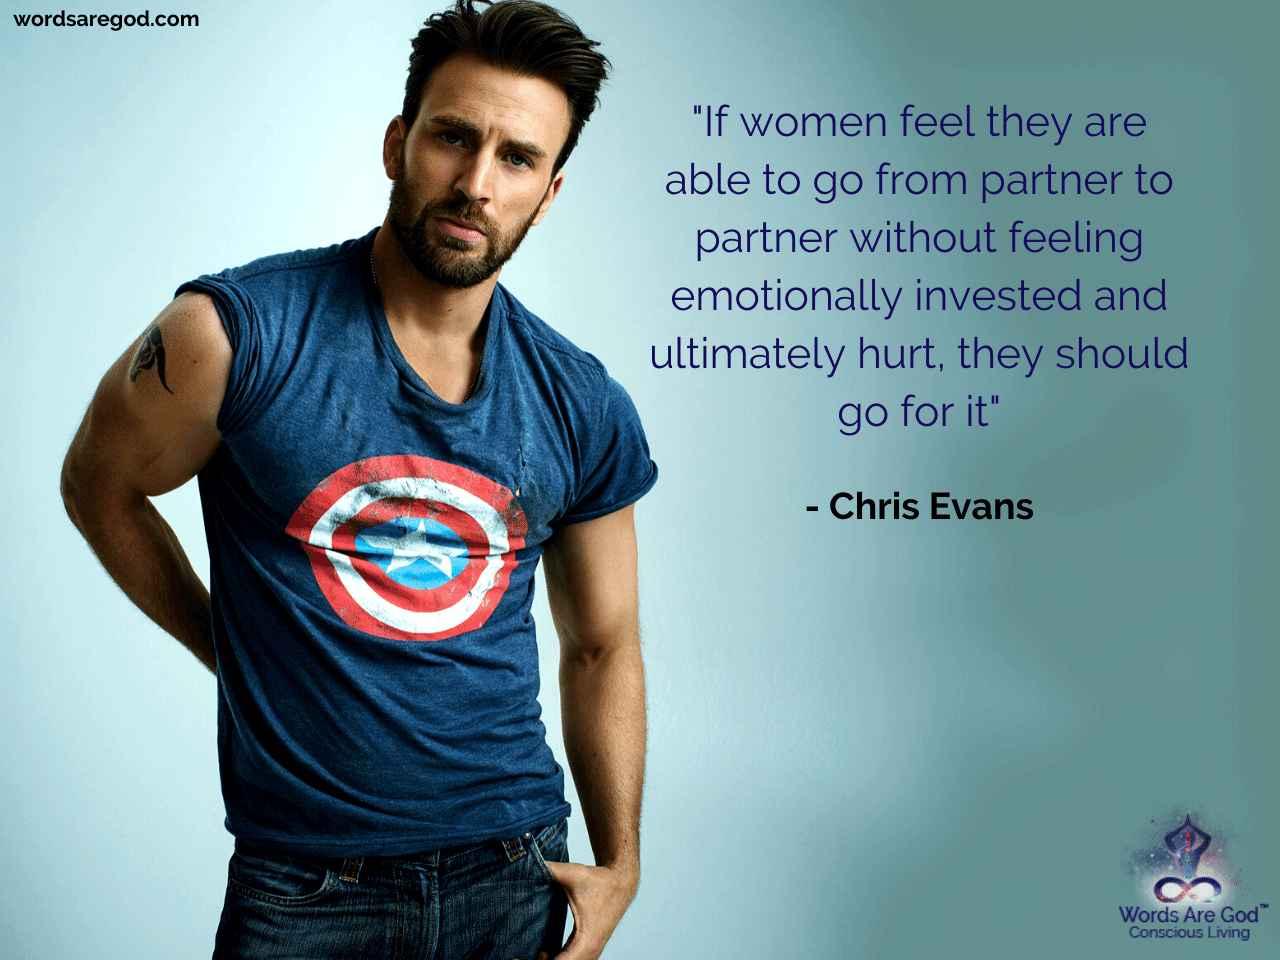 Chris Evans Best Quote by Chris Evans